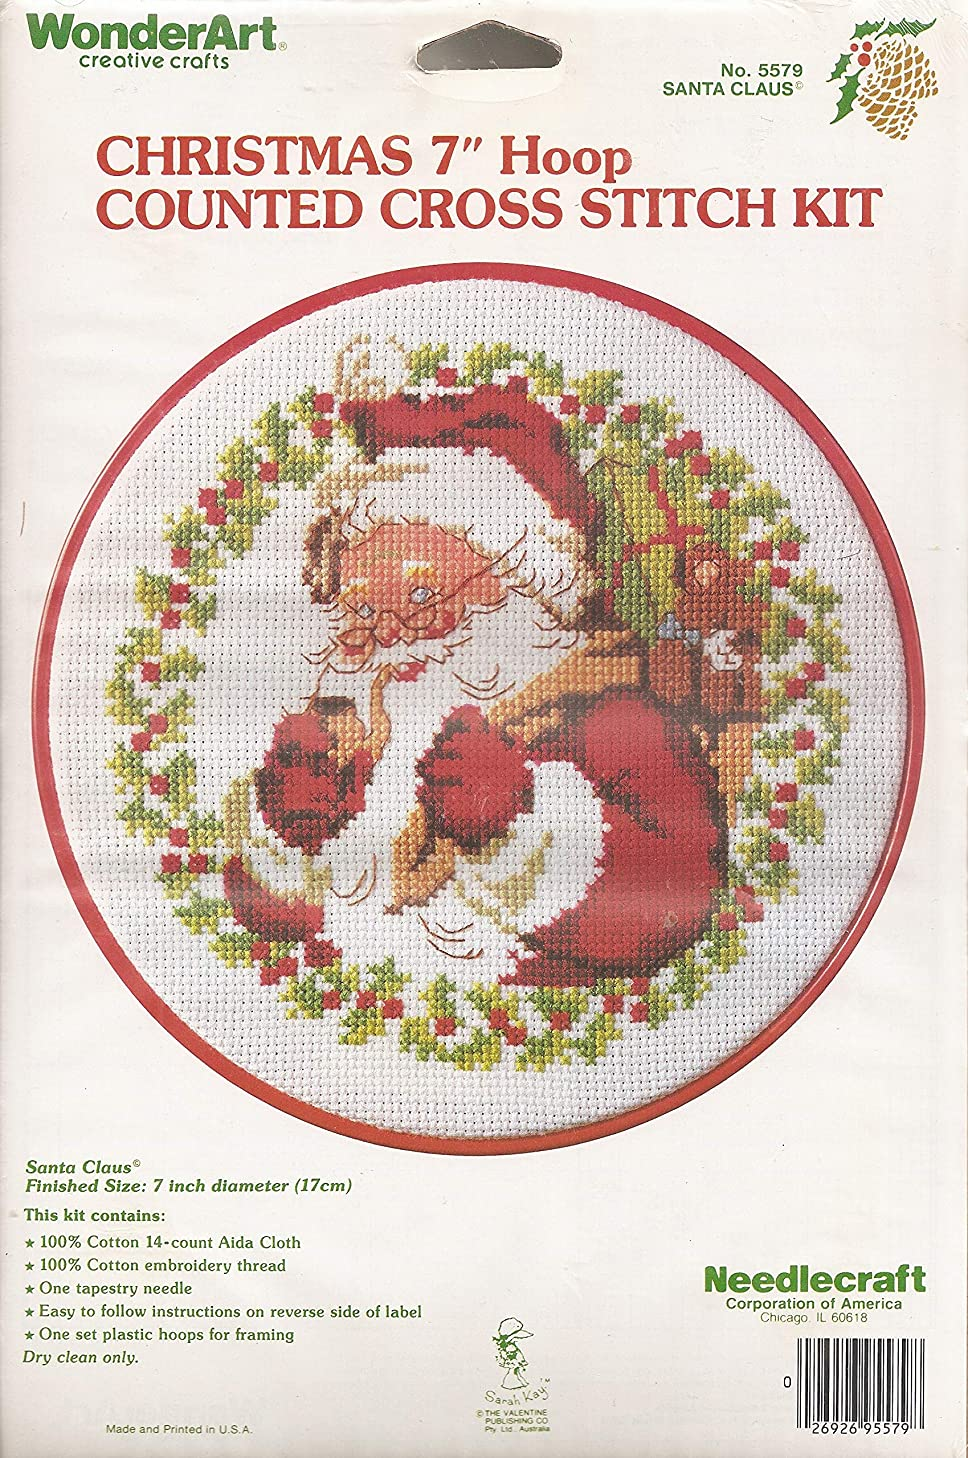 WonderArt Christmas 7